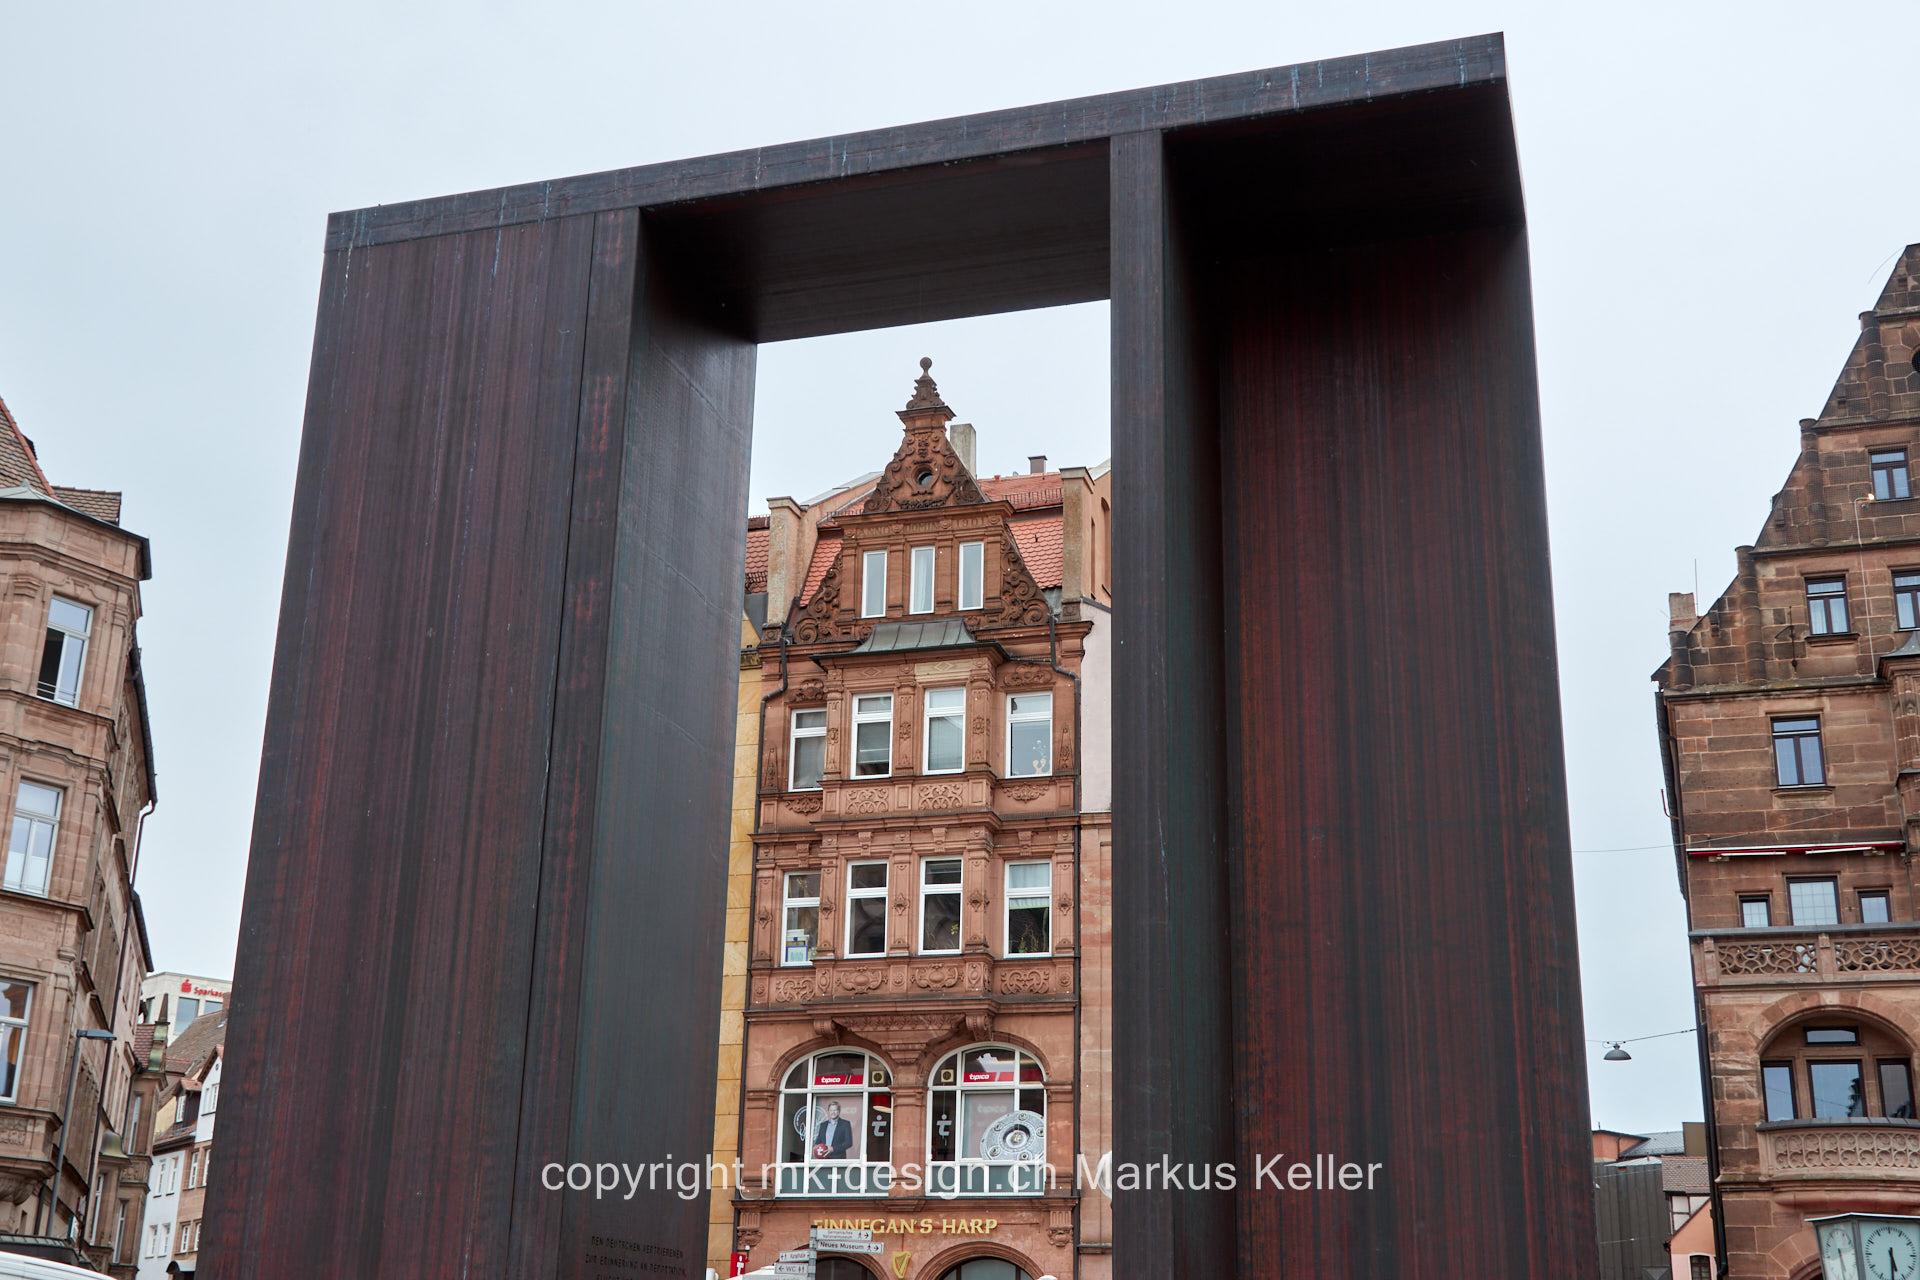 Bauwerk   Fassade   Statue/Skulptur   Park/Platz/Strasse